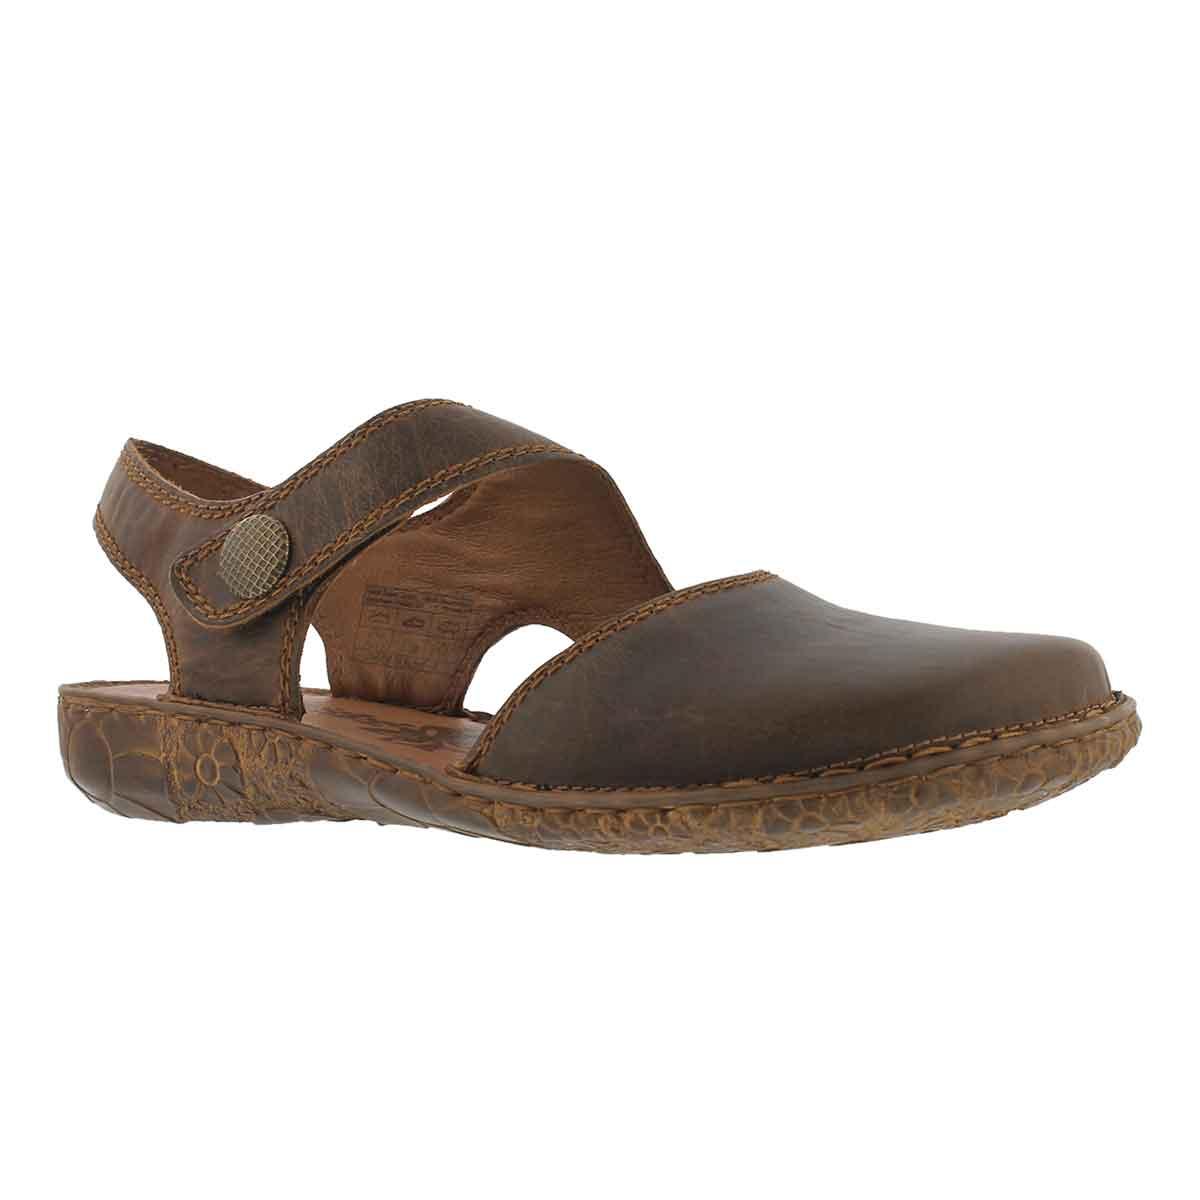 Women's ROSEALIE 27 brandy casual sandals